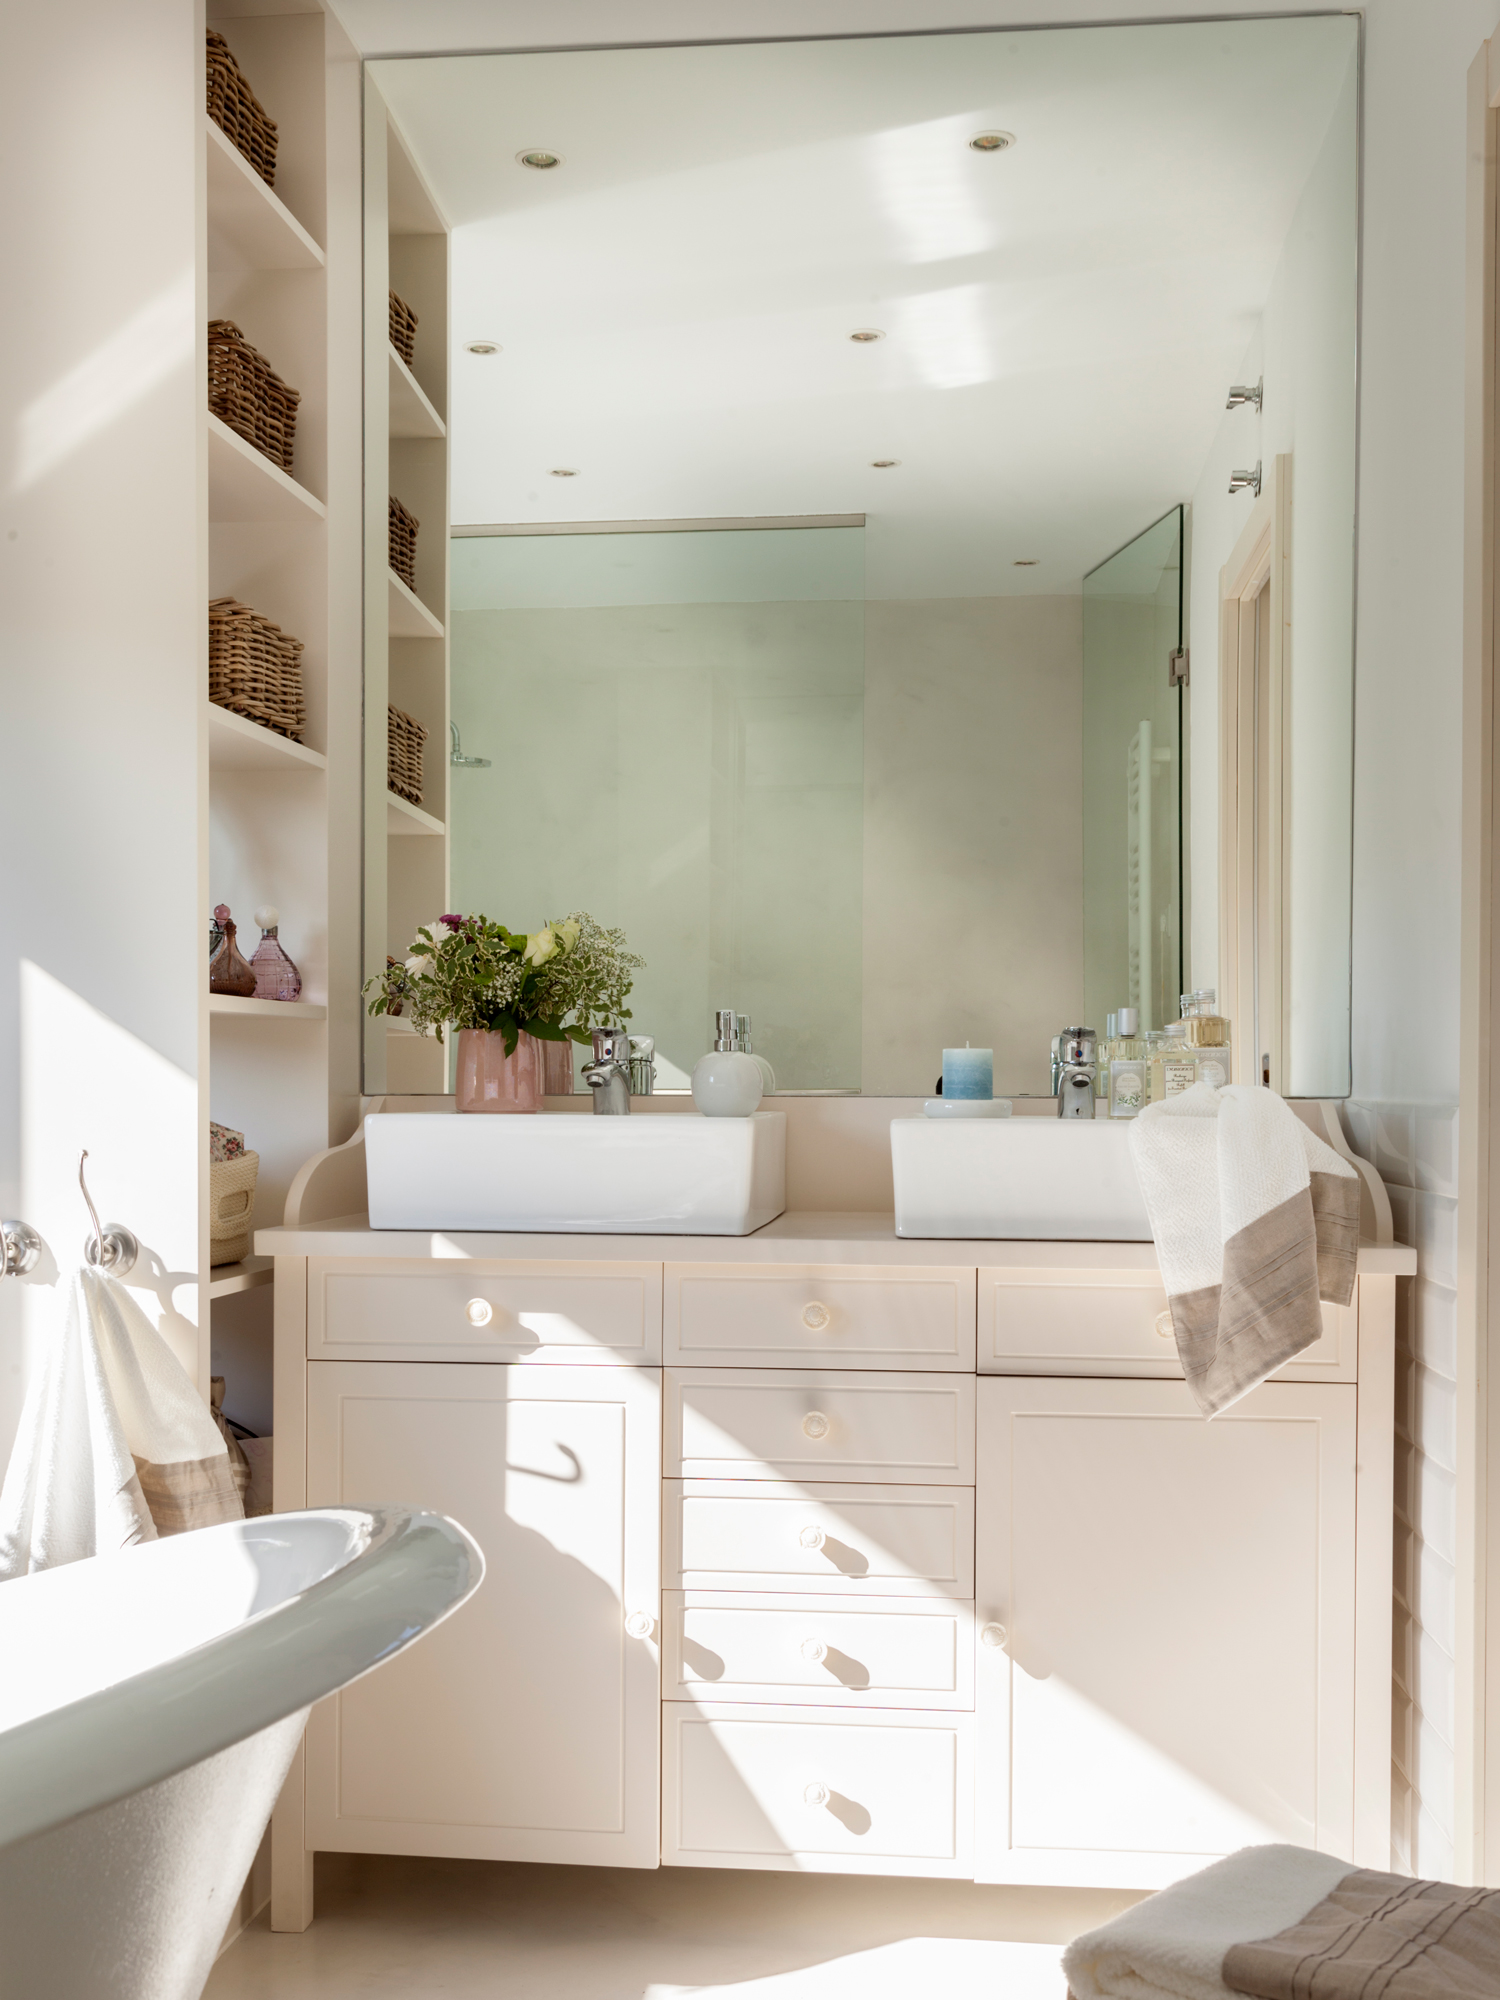 Muebles perfectos para ba os peque os for Soluciones para banos muy pequenos